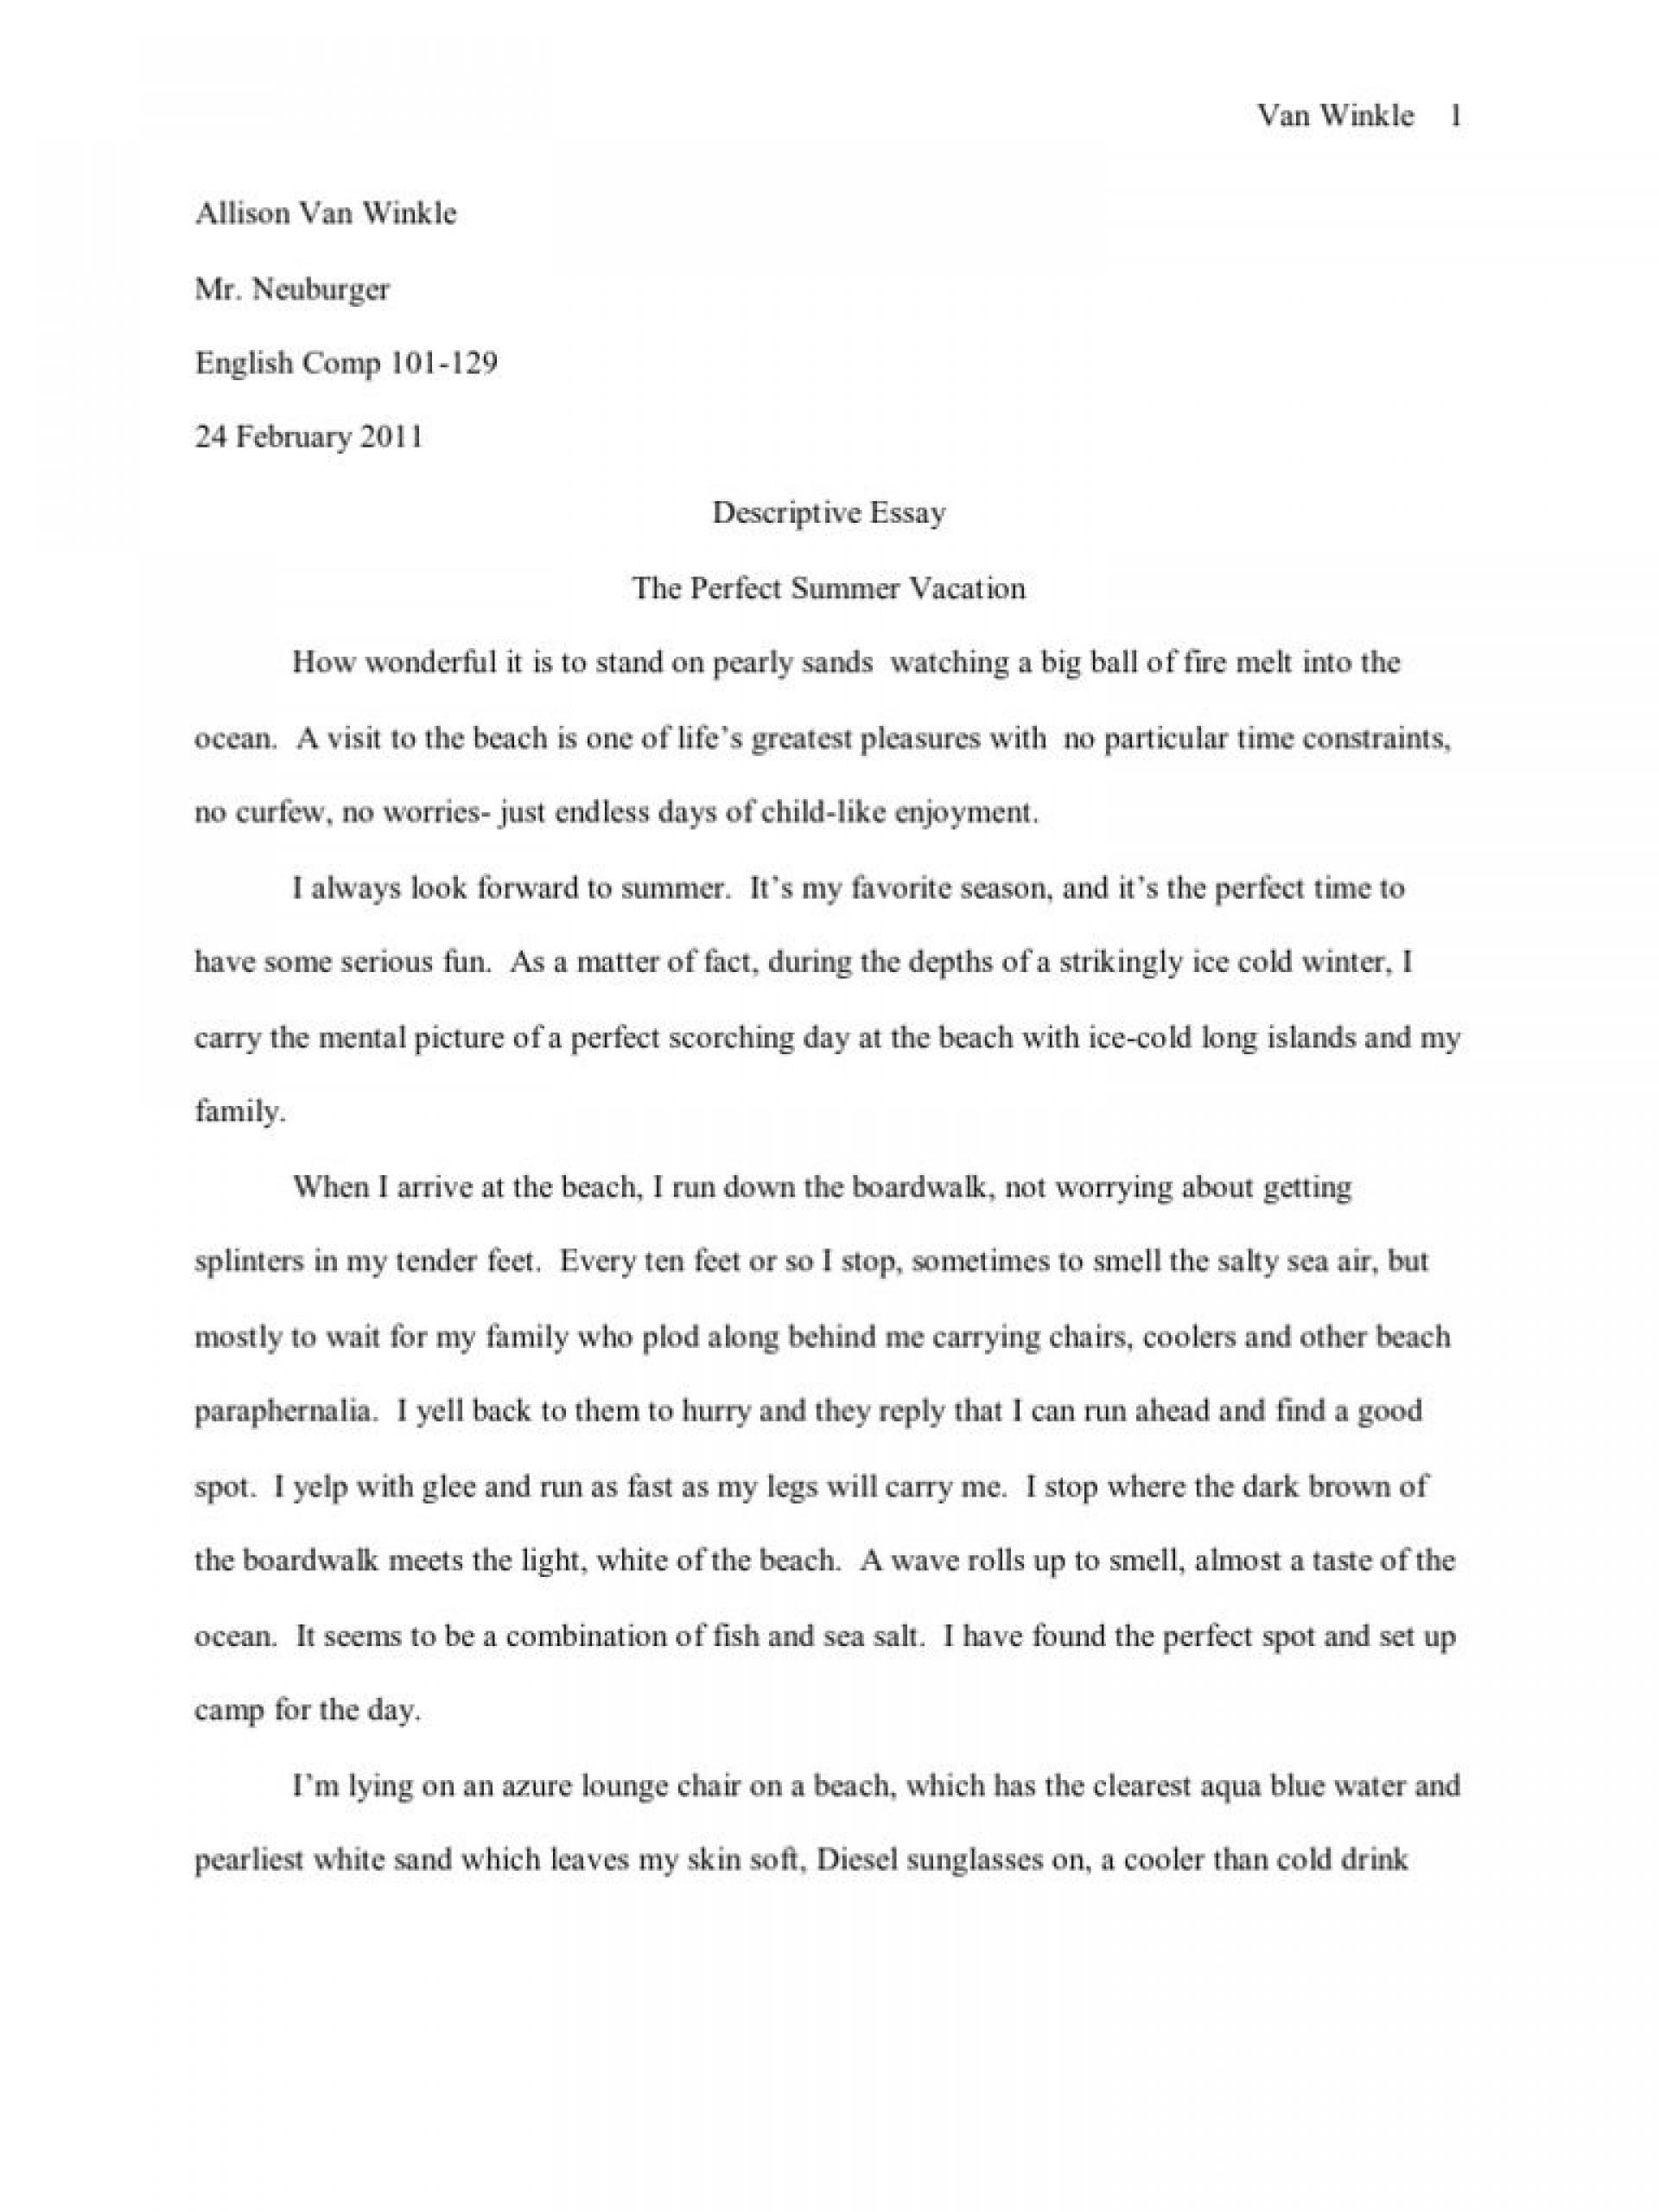 011 Descriptive Essay About The Beach Impressive Free Sample 1920